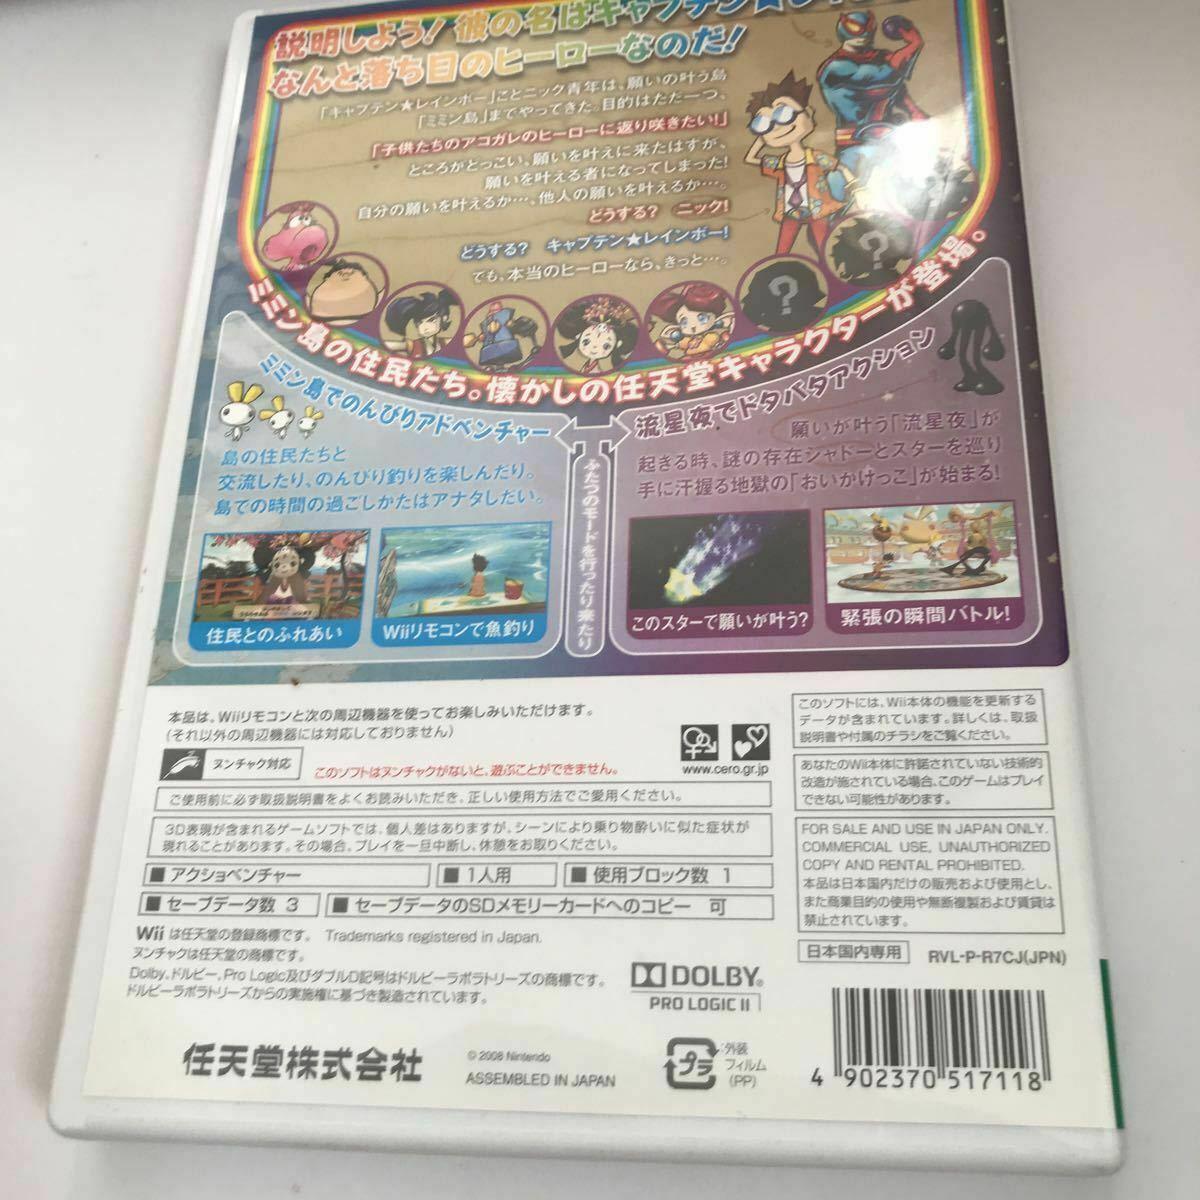 Nintendo Wii CAPTAIN RAINBOW image 2